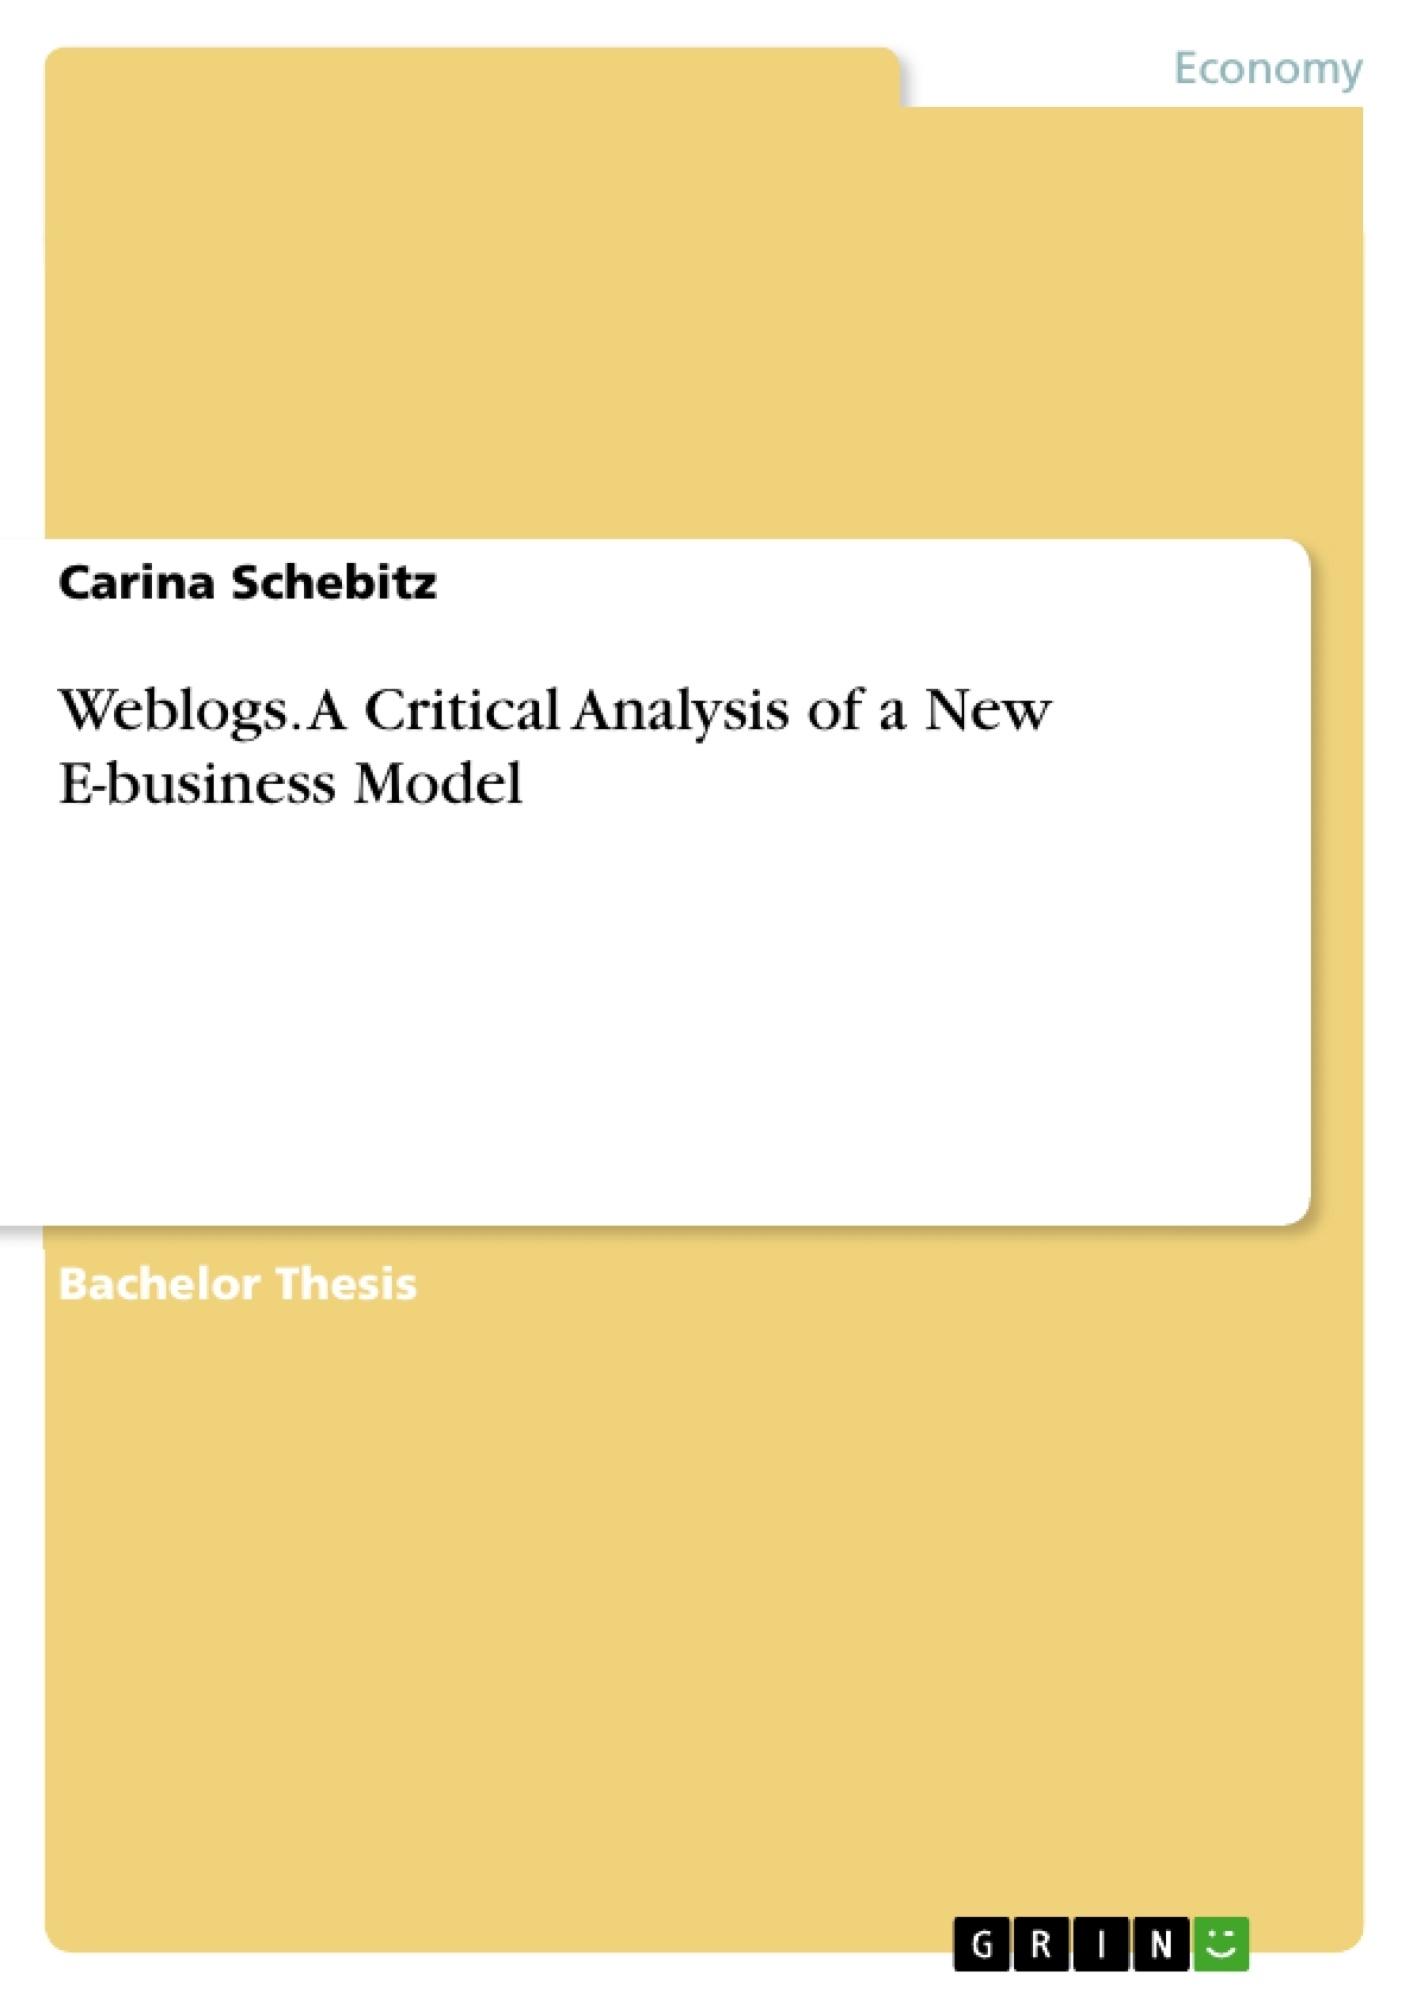 Title: Weblogs. A Critical Analysis of a New E-business Model